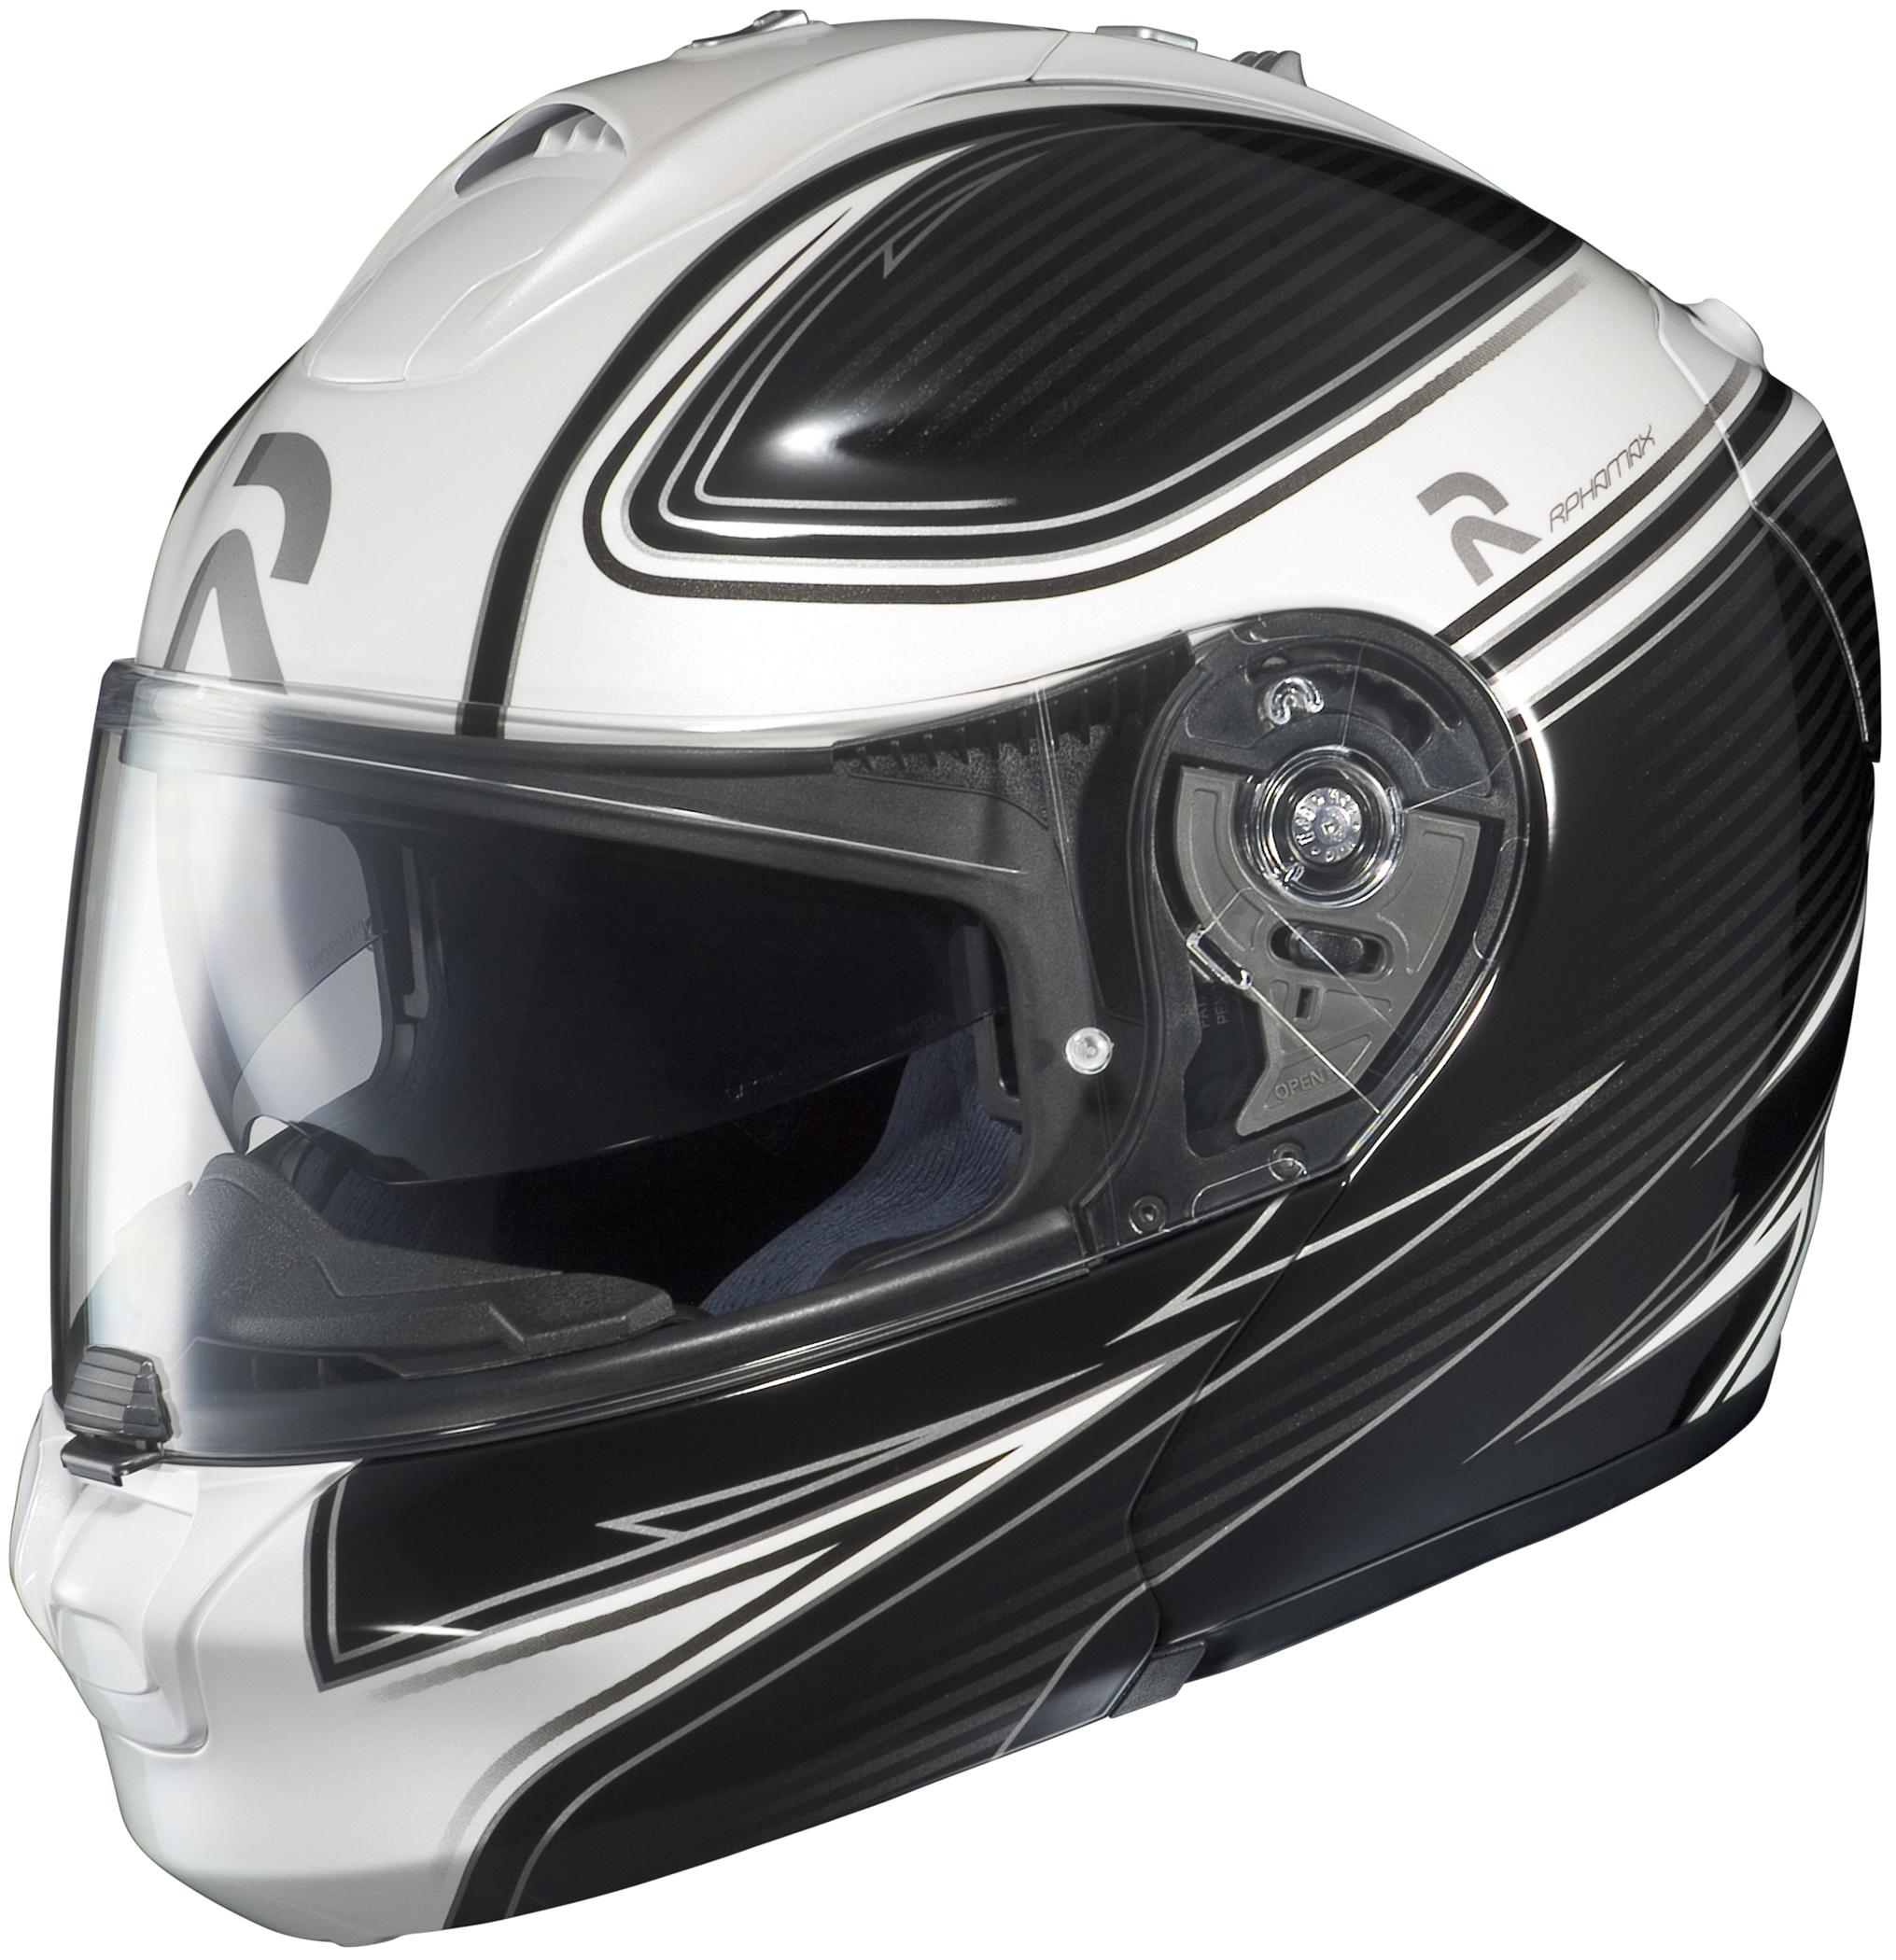 RPHA MAX Align Helmet